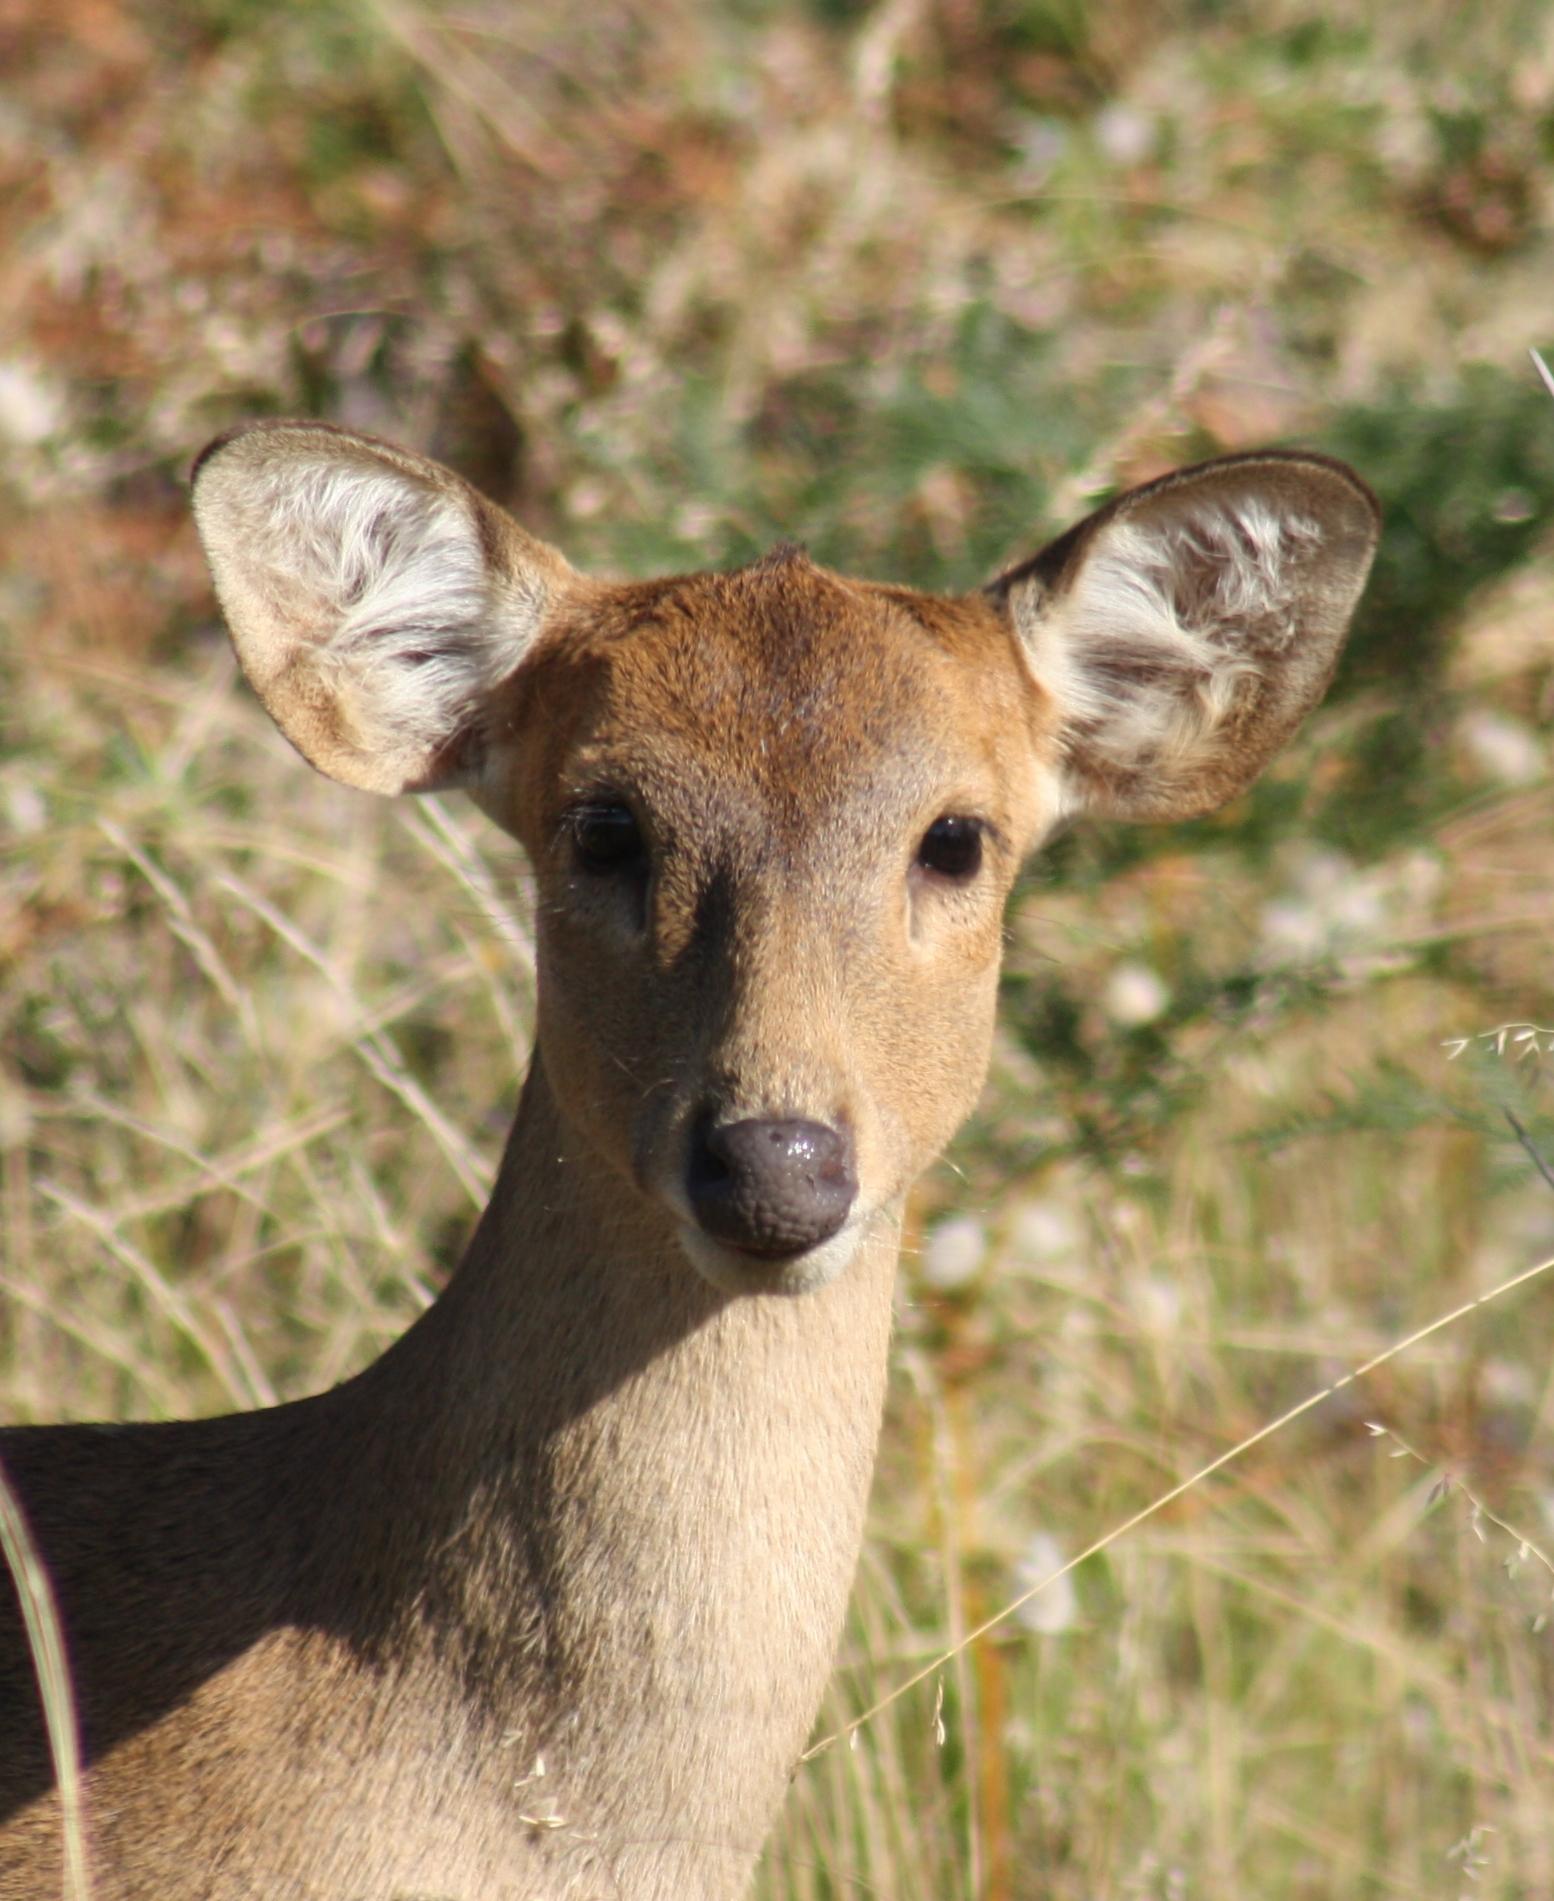 Last chance to apply for 2018 Hog deer ballot